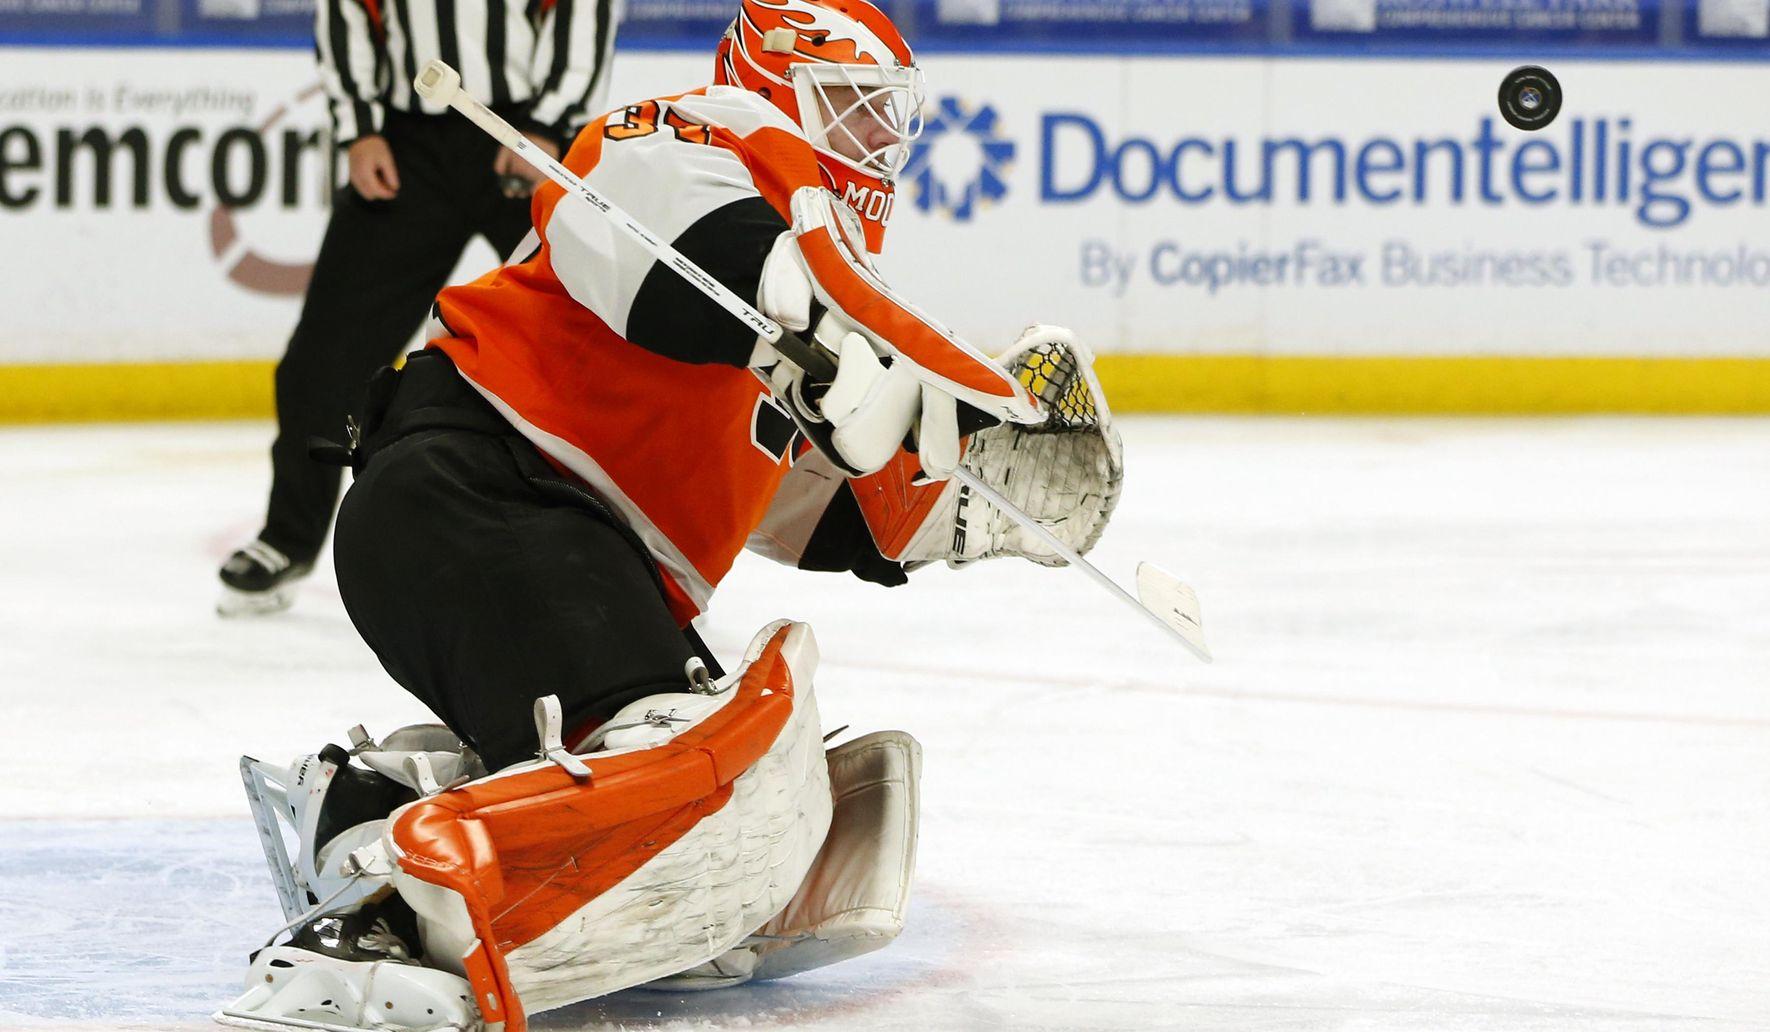 Flyers_sabres_hockey_60222_c0-151-3600-2249_s1770x1032